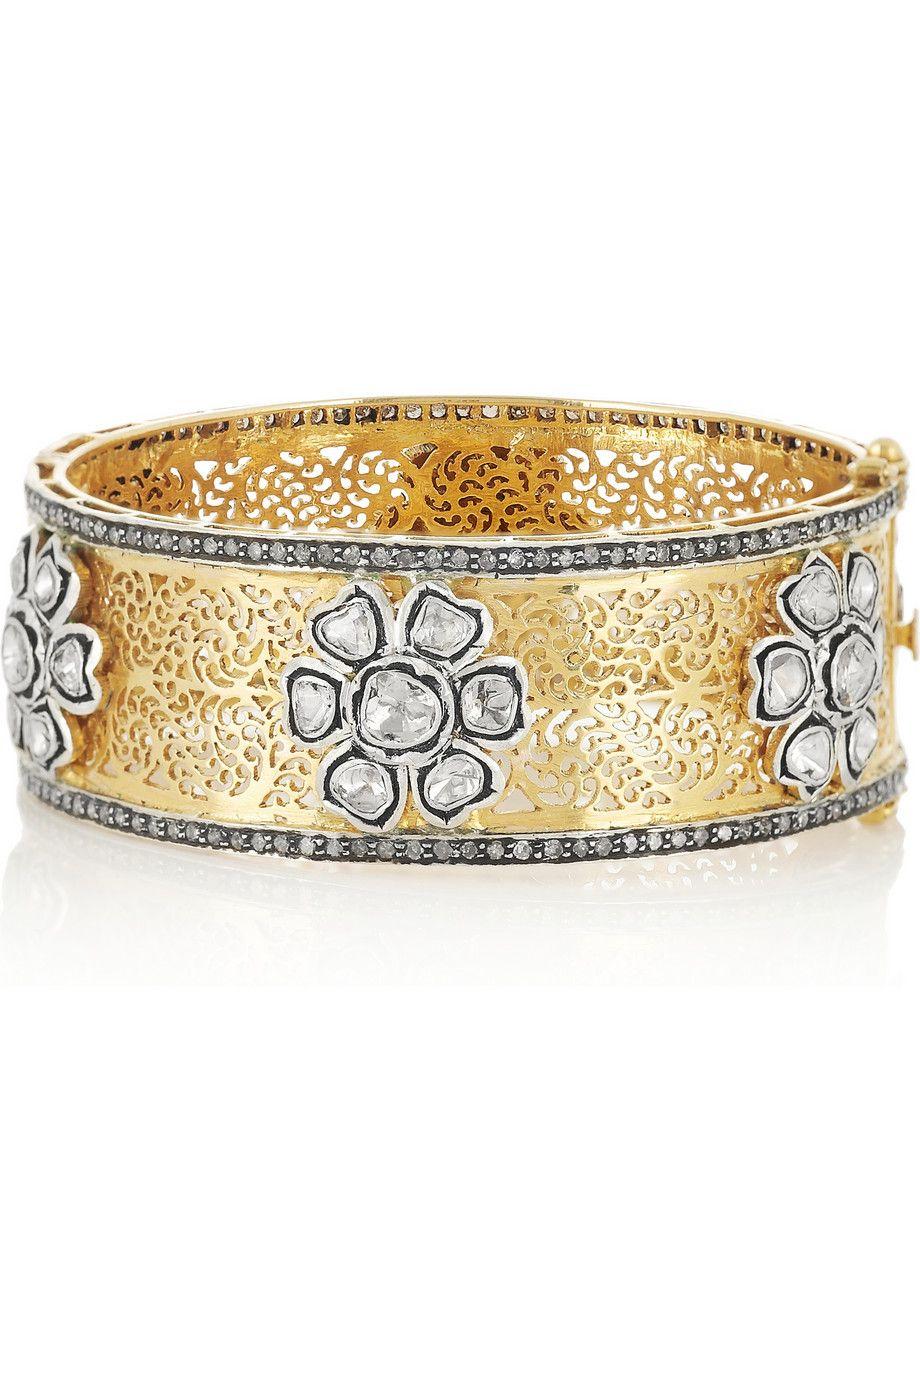 Artisan karat goldplated sterling silver diamond bangle